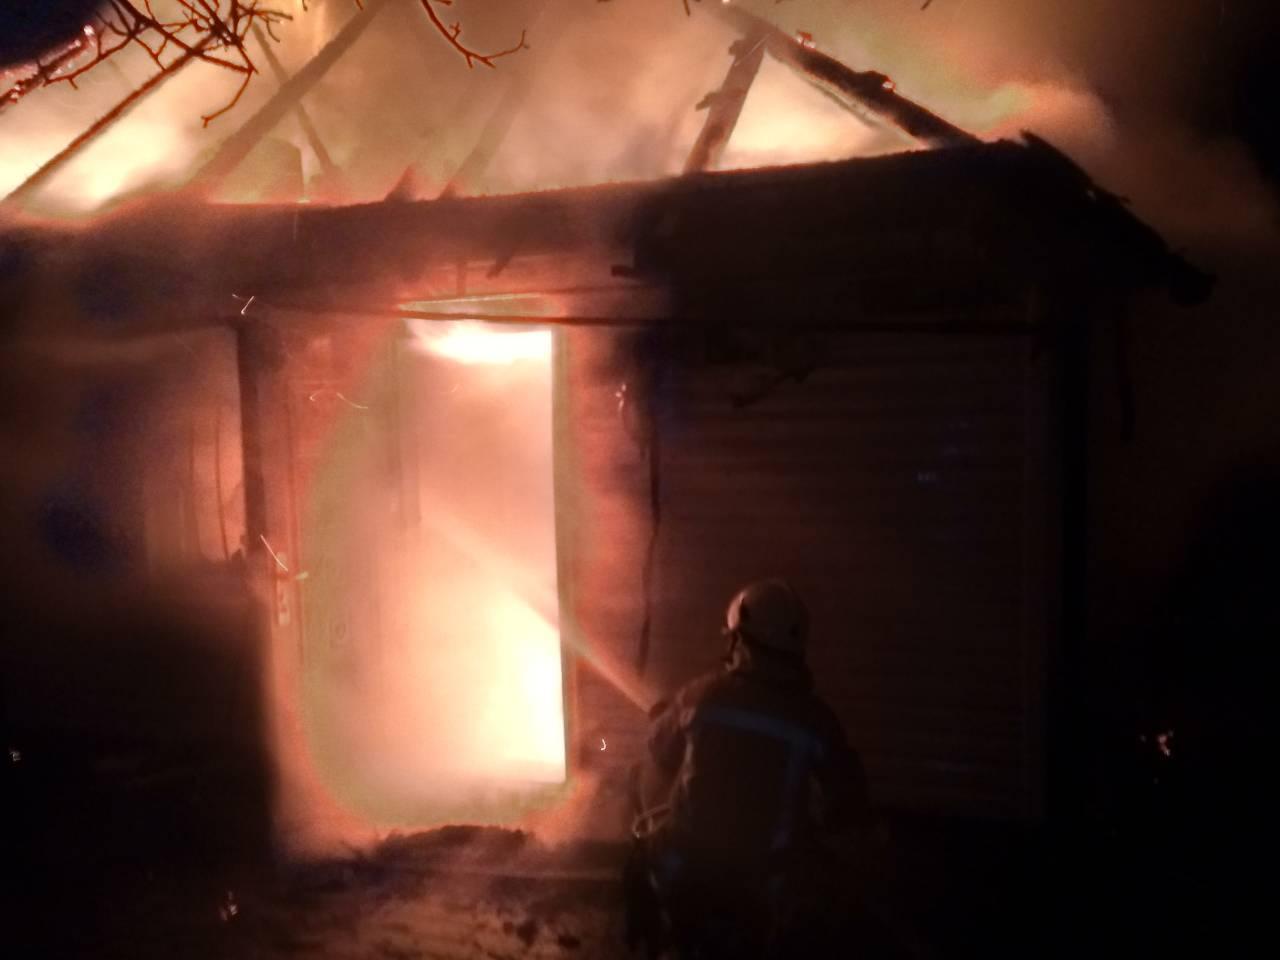 На Миронівщині вщент згоріла баня -  - IMG a155eaa81be518081e969ae30fedf323 V